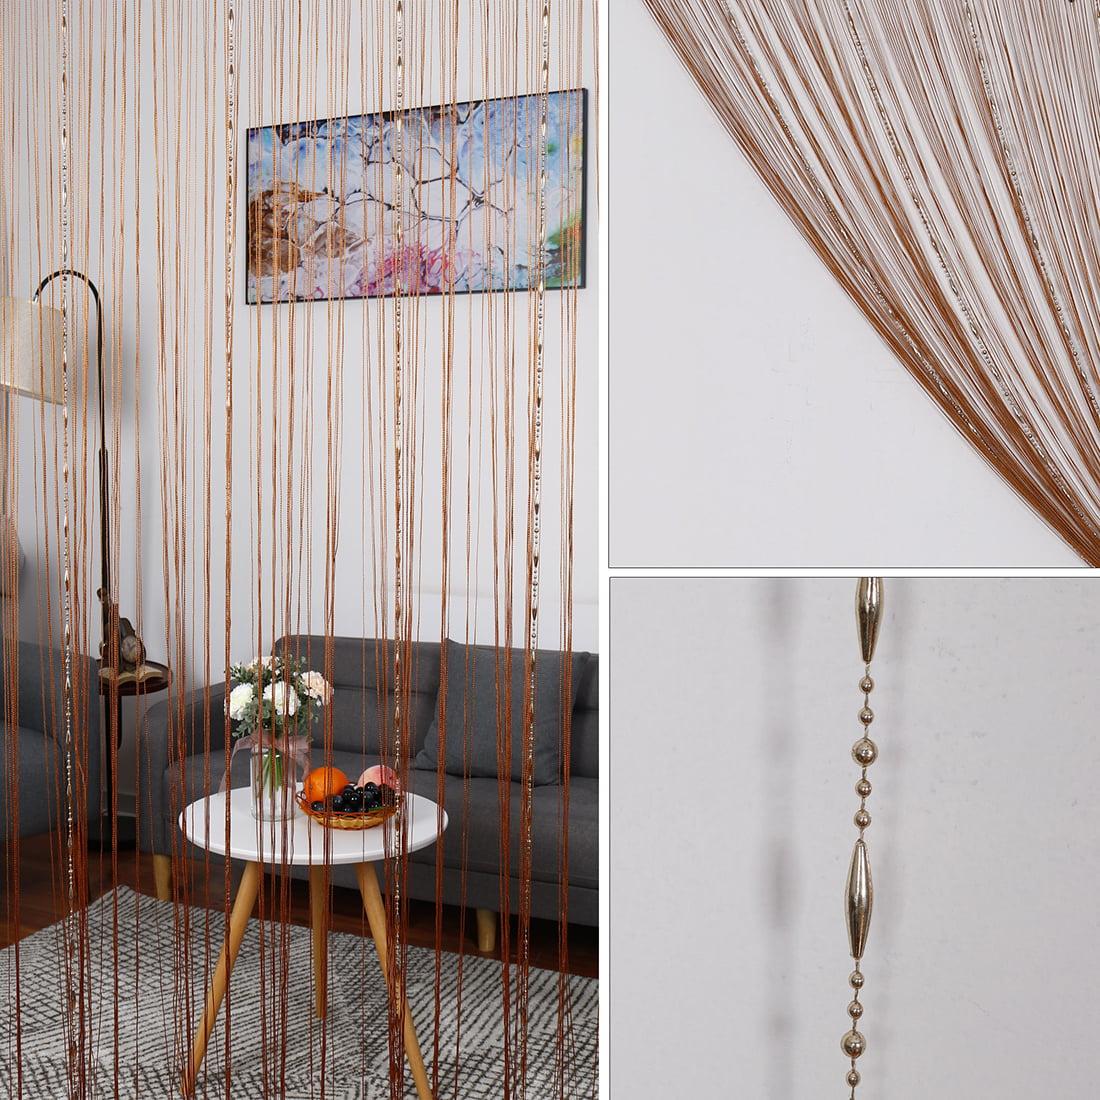 1//2M String Door Curtain Fringe Beads Room Divider Window Wedding Panel